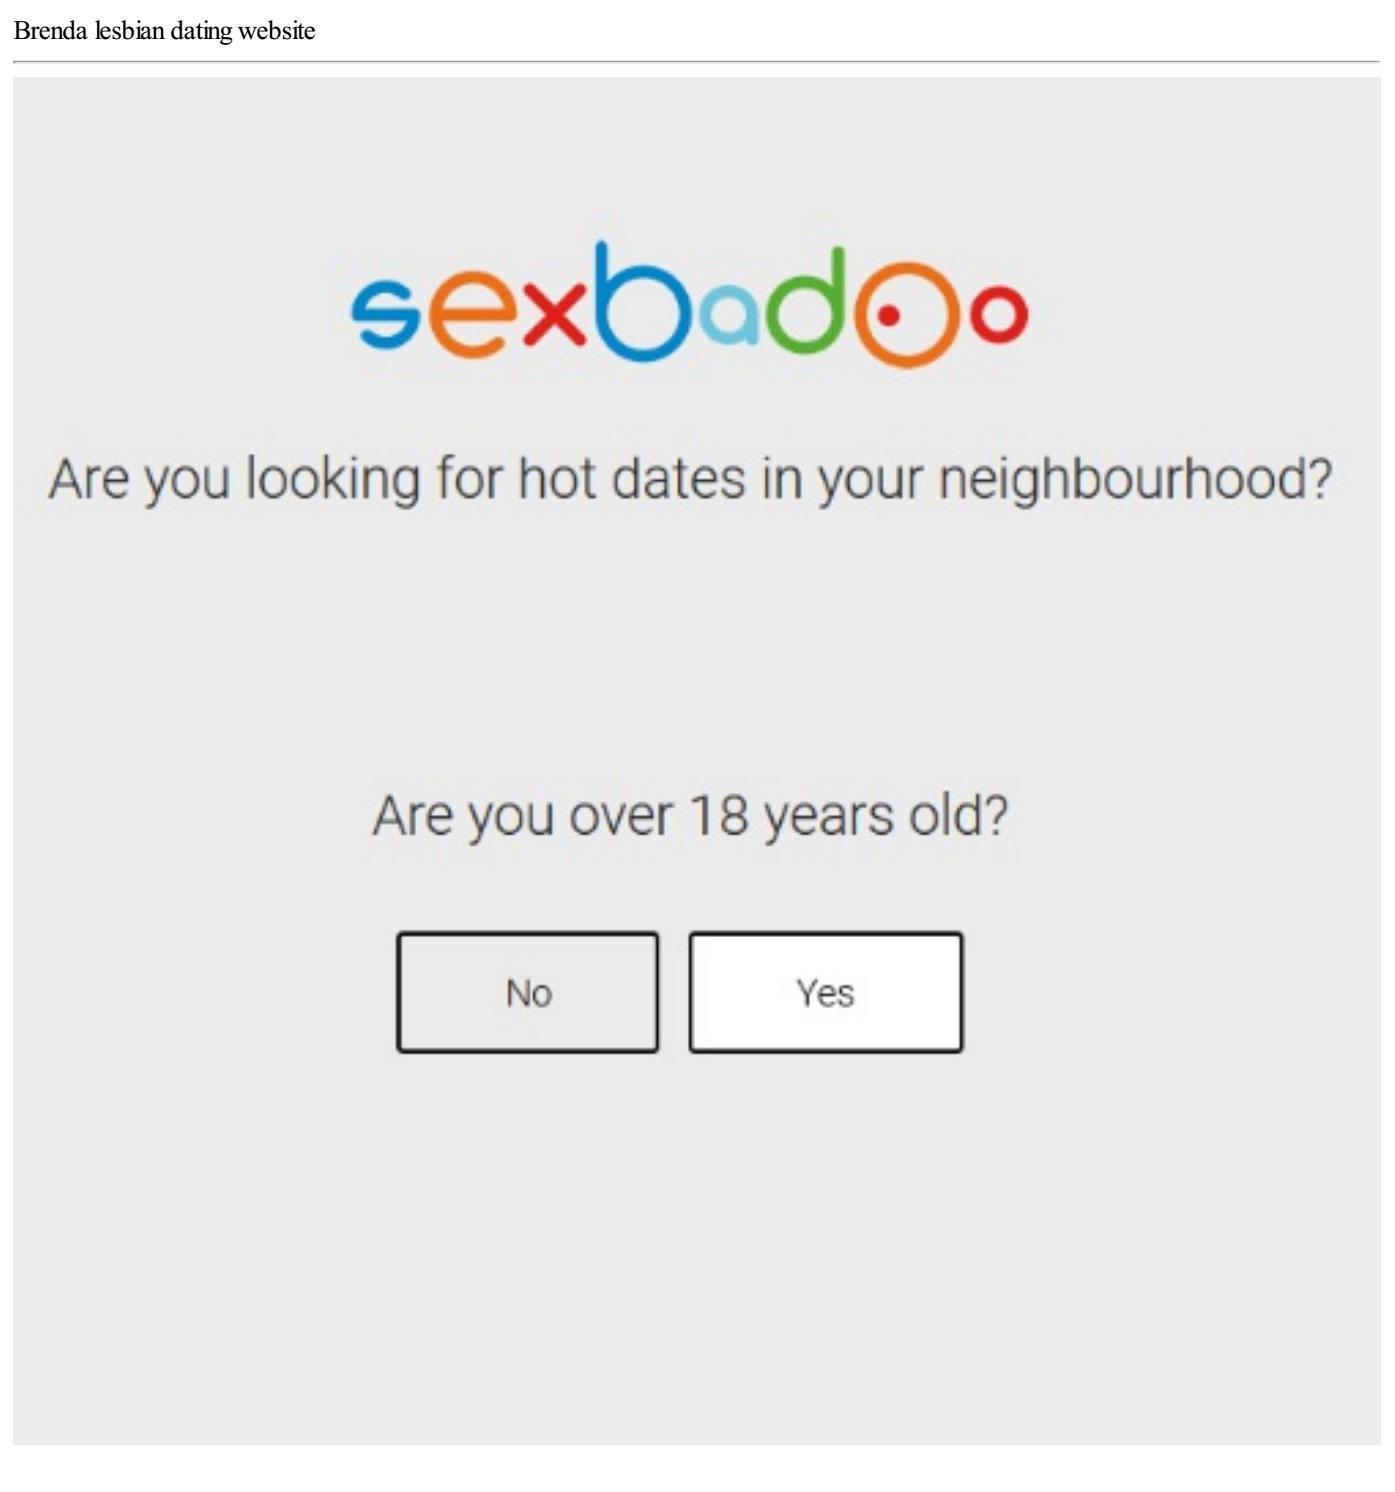 Brenda lesbian dating site